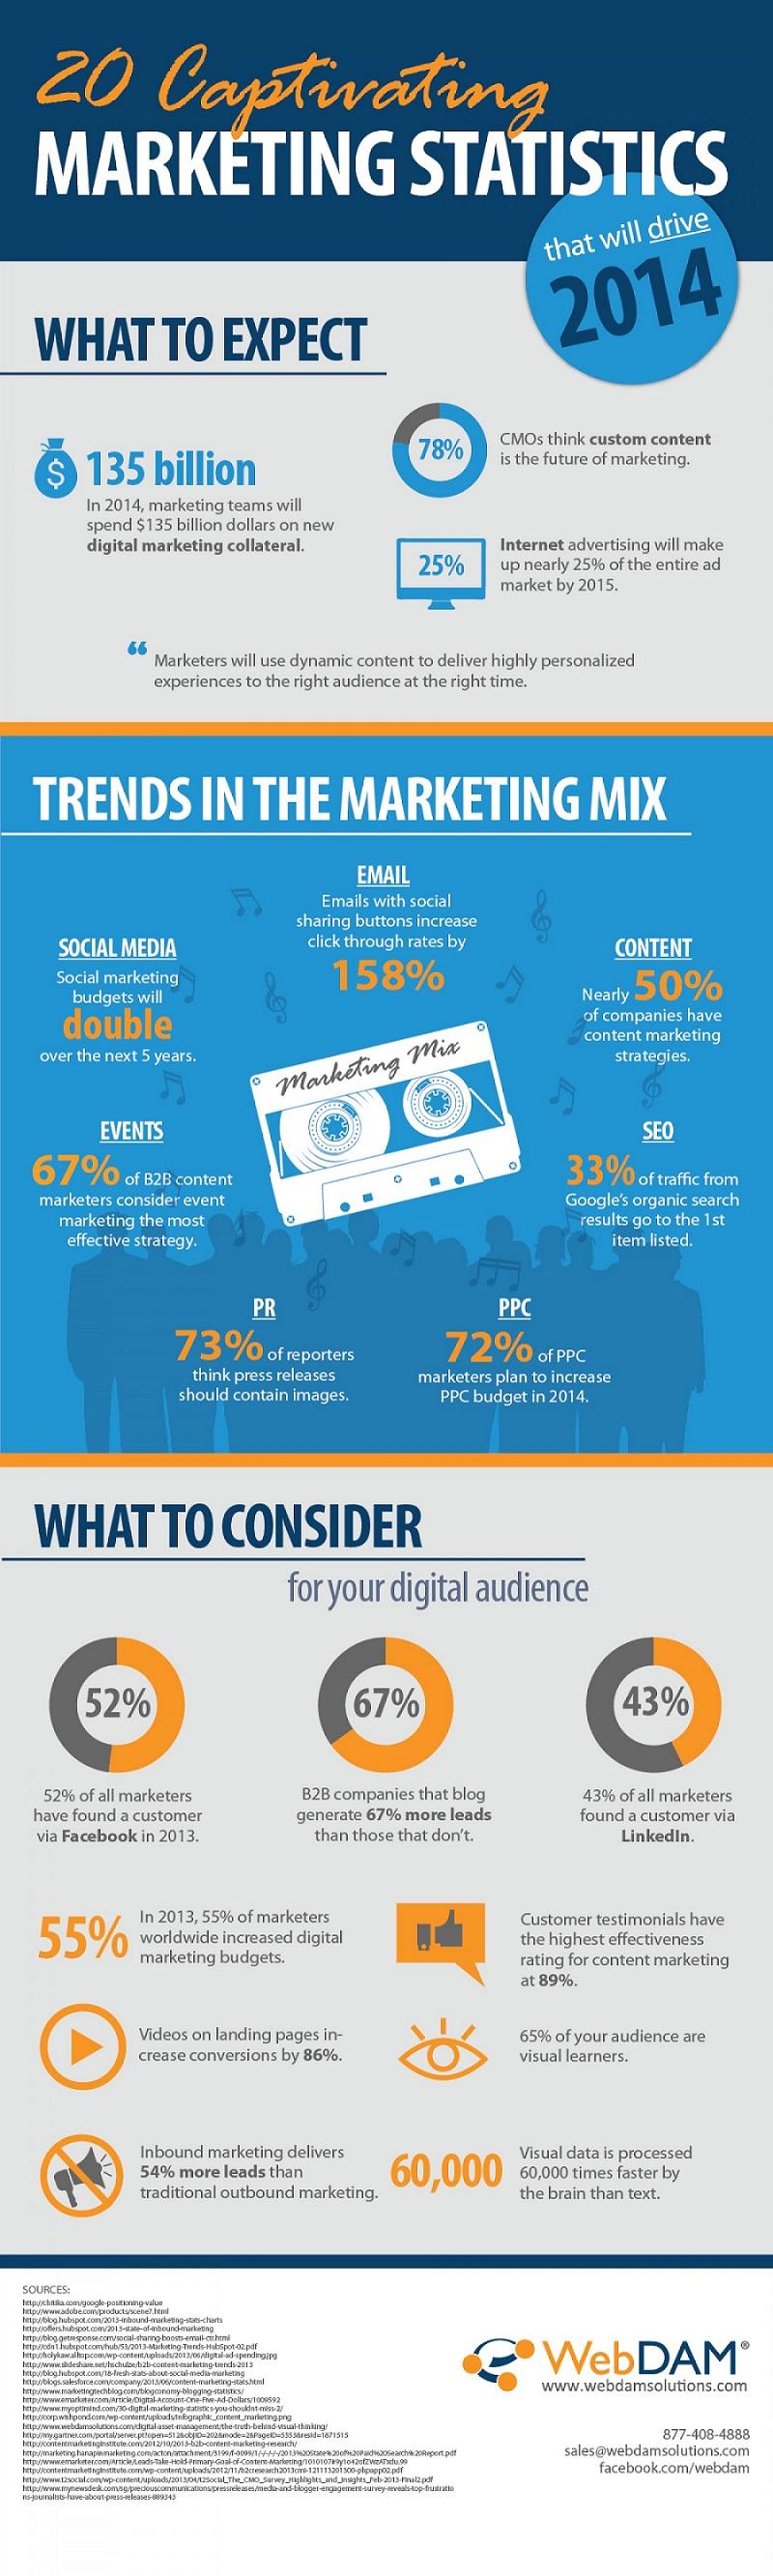 20-captivating-marketing-statistics-2014